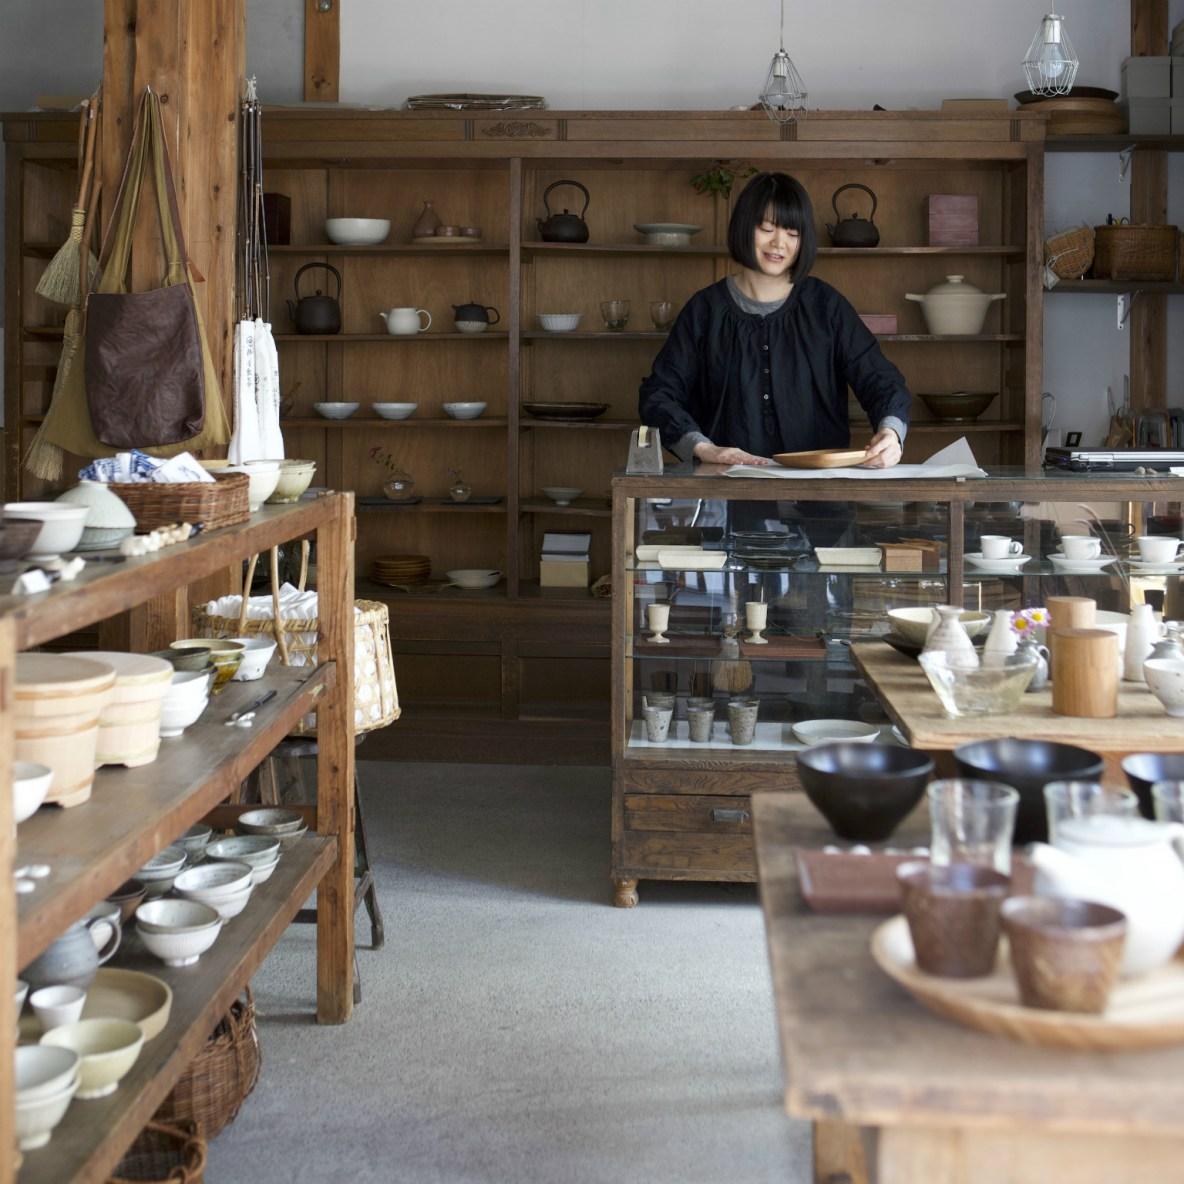 Slow-life kitchenware inspired by wisdom of rural craftsmen